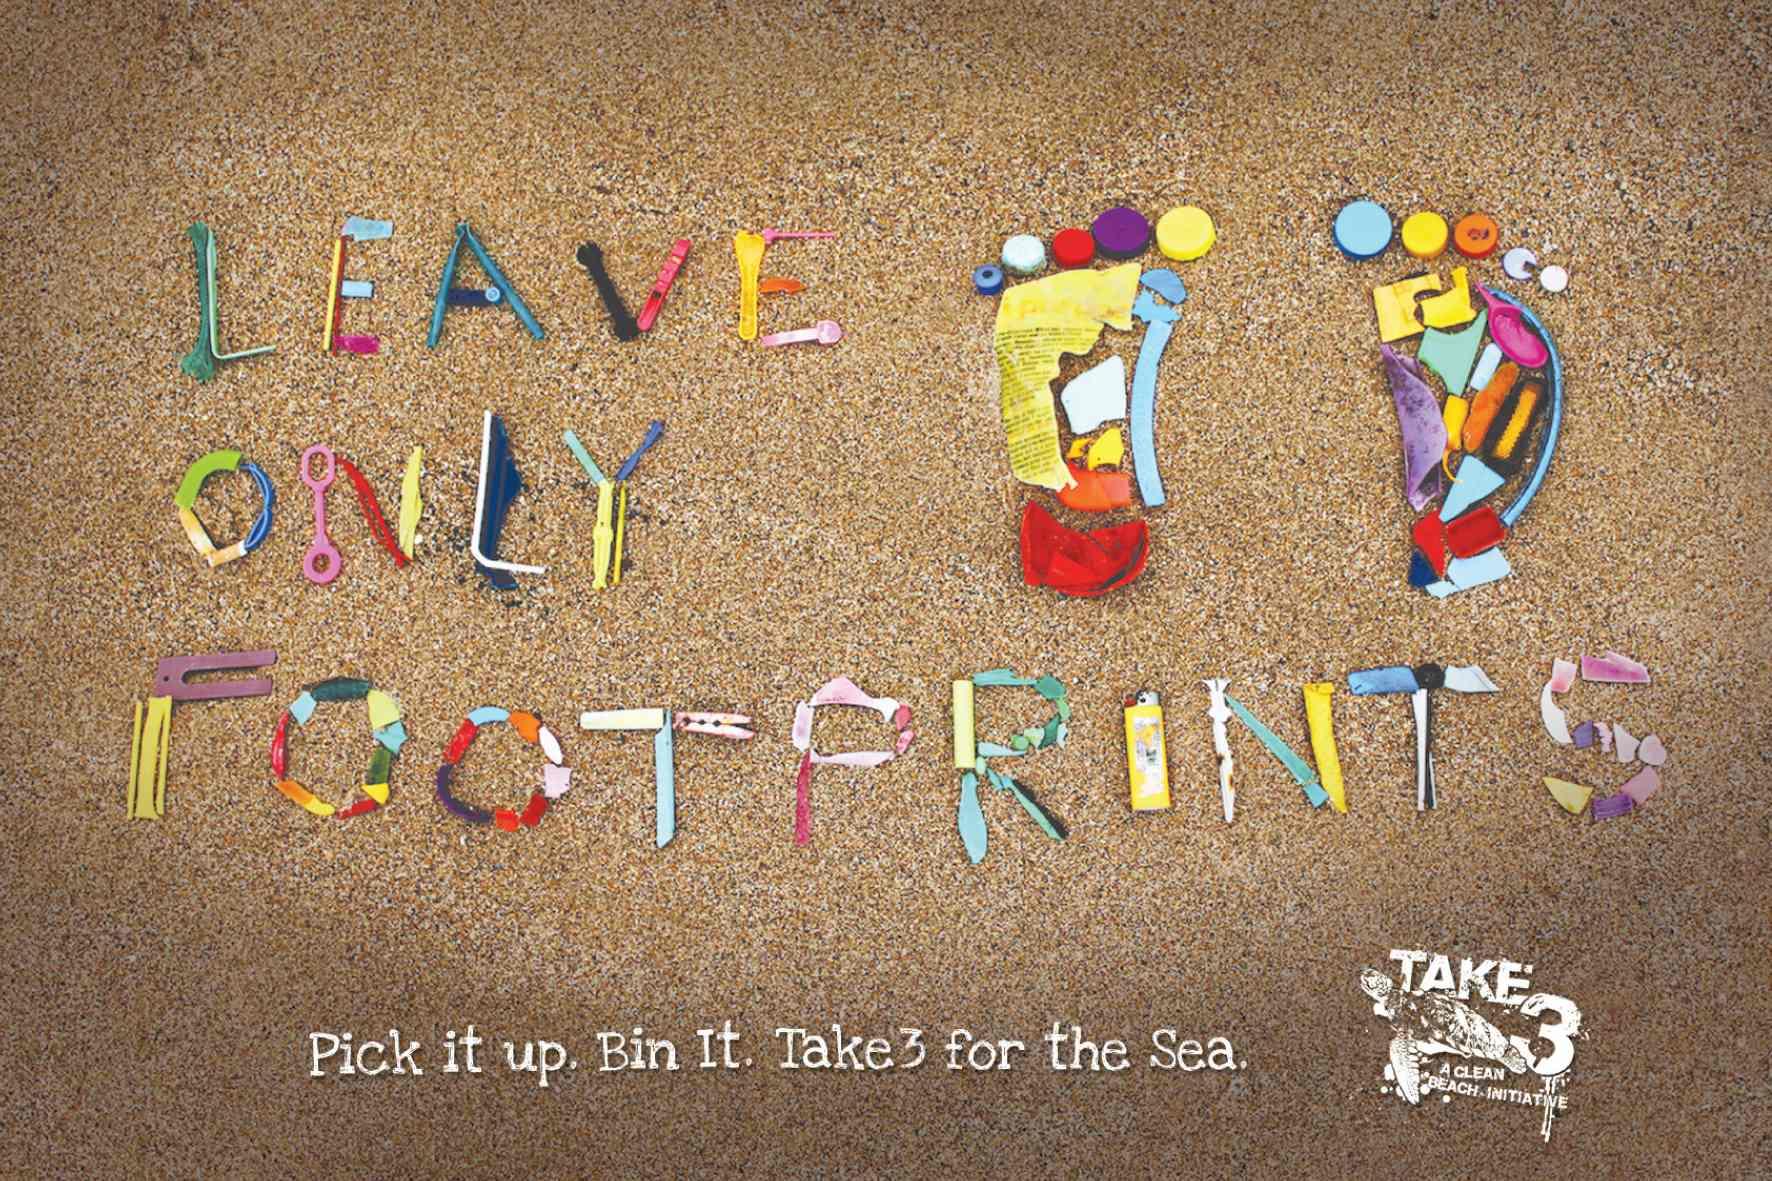 Take 3 postcard front 3 footprints LR.jpg